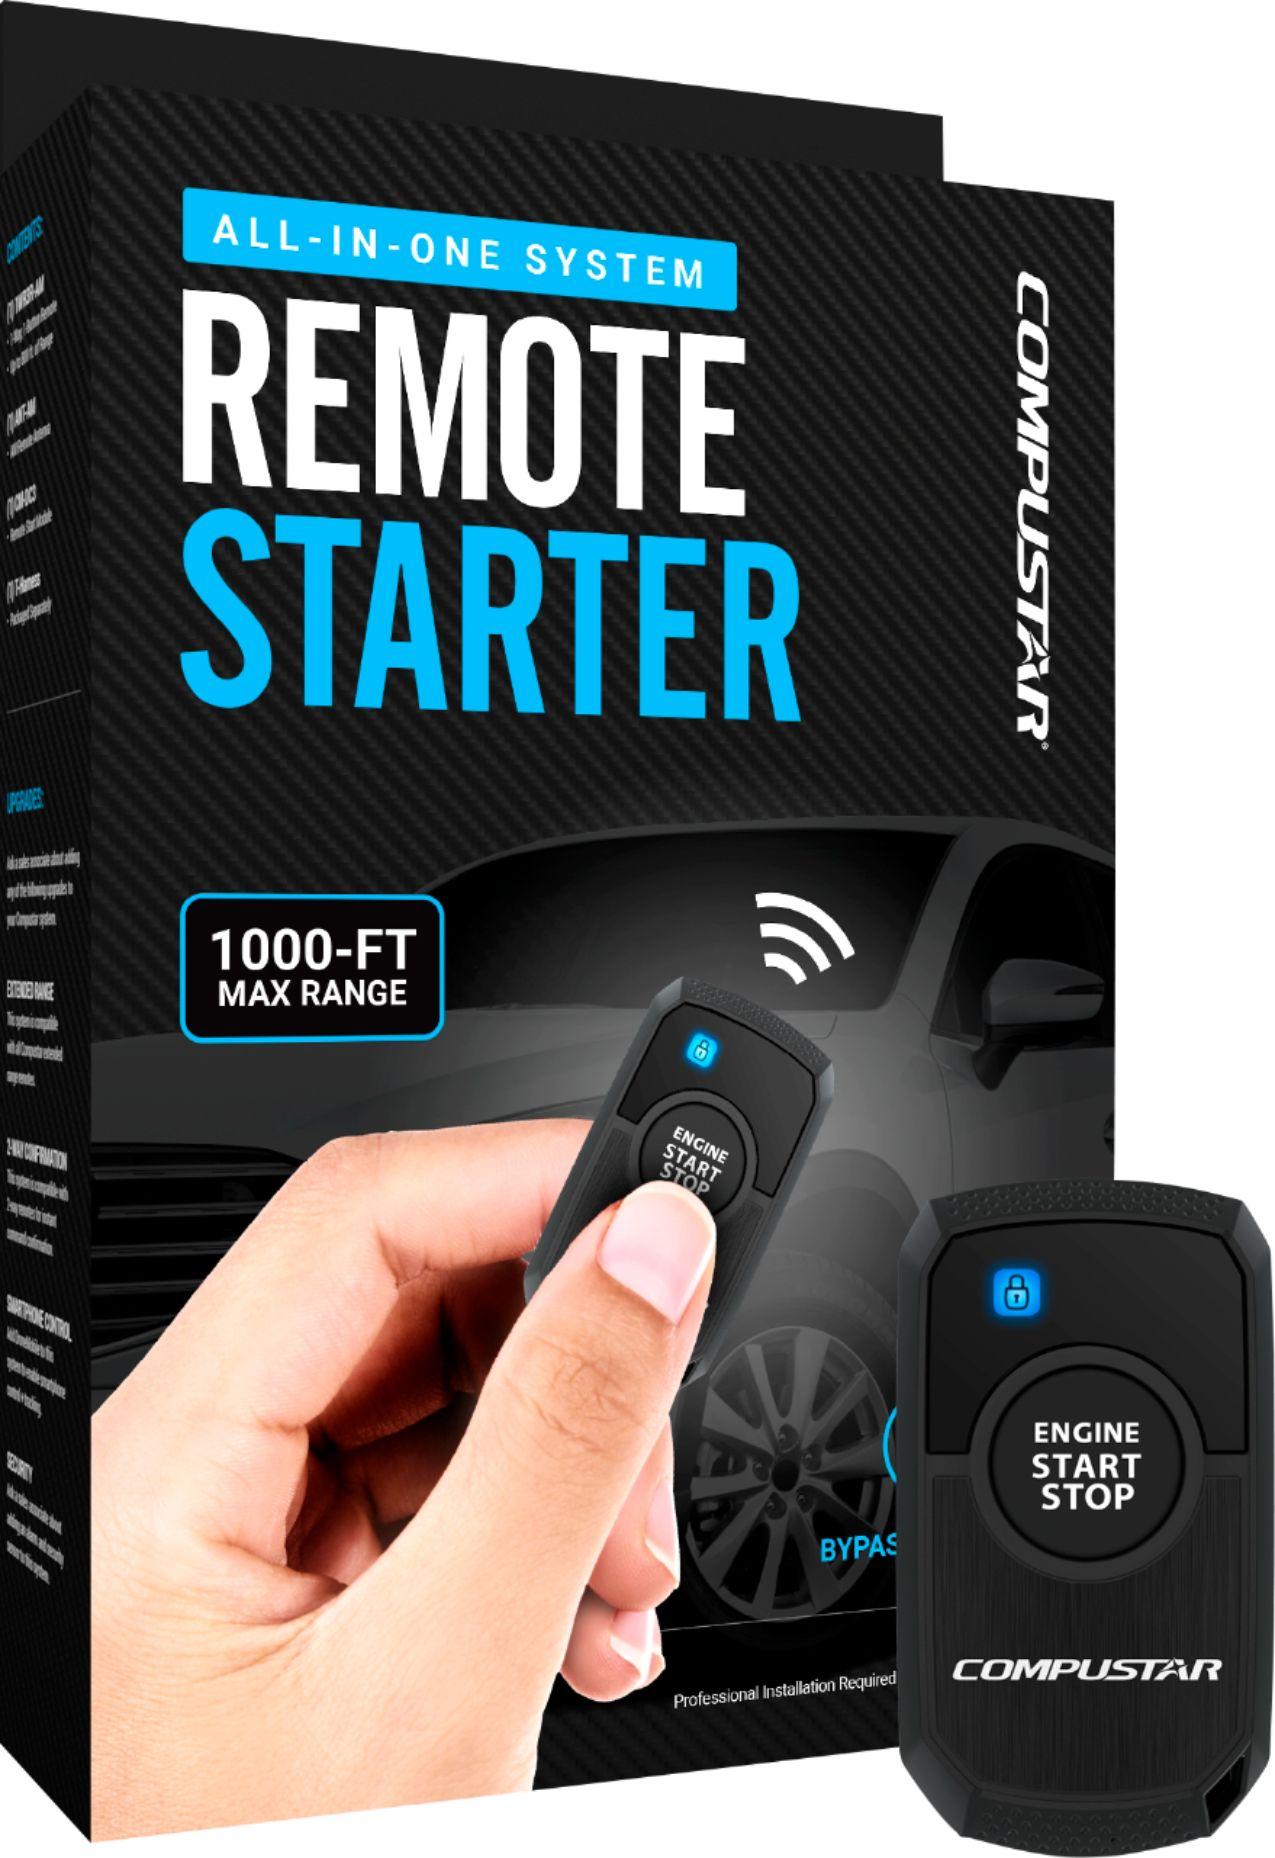 hight resolution of compustar 1 button remote starter t harness kit 2nd gen installation required black rs1b dc3 best buy